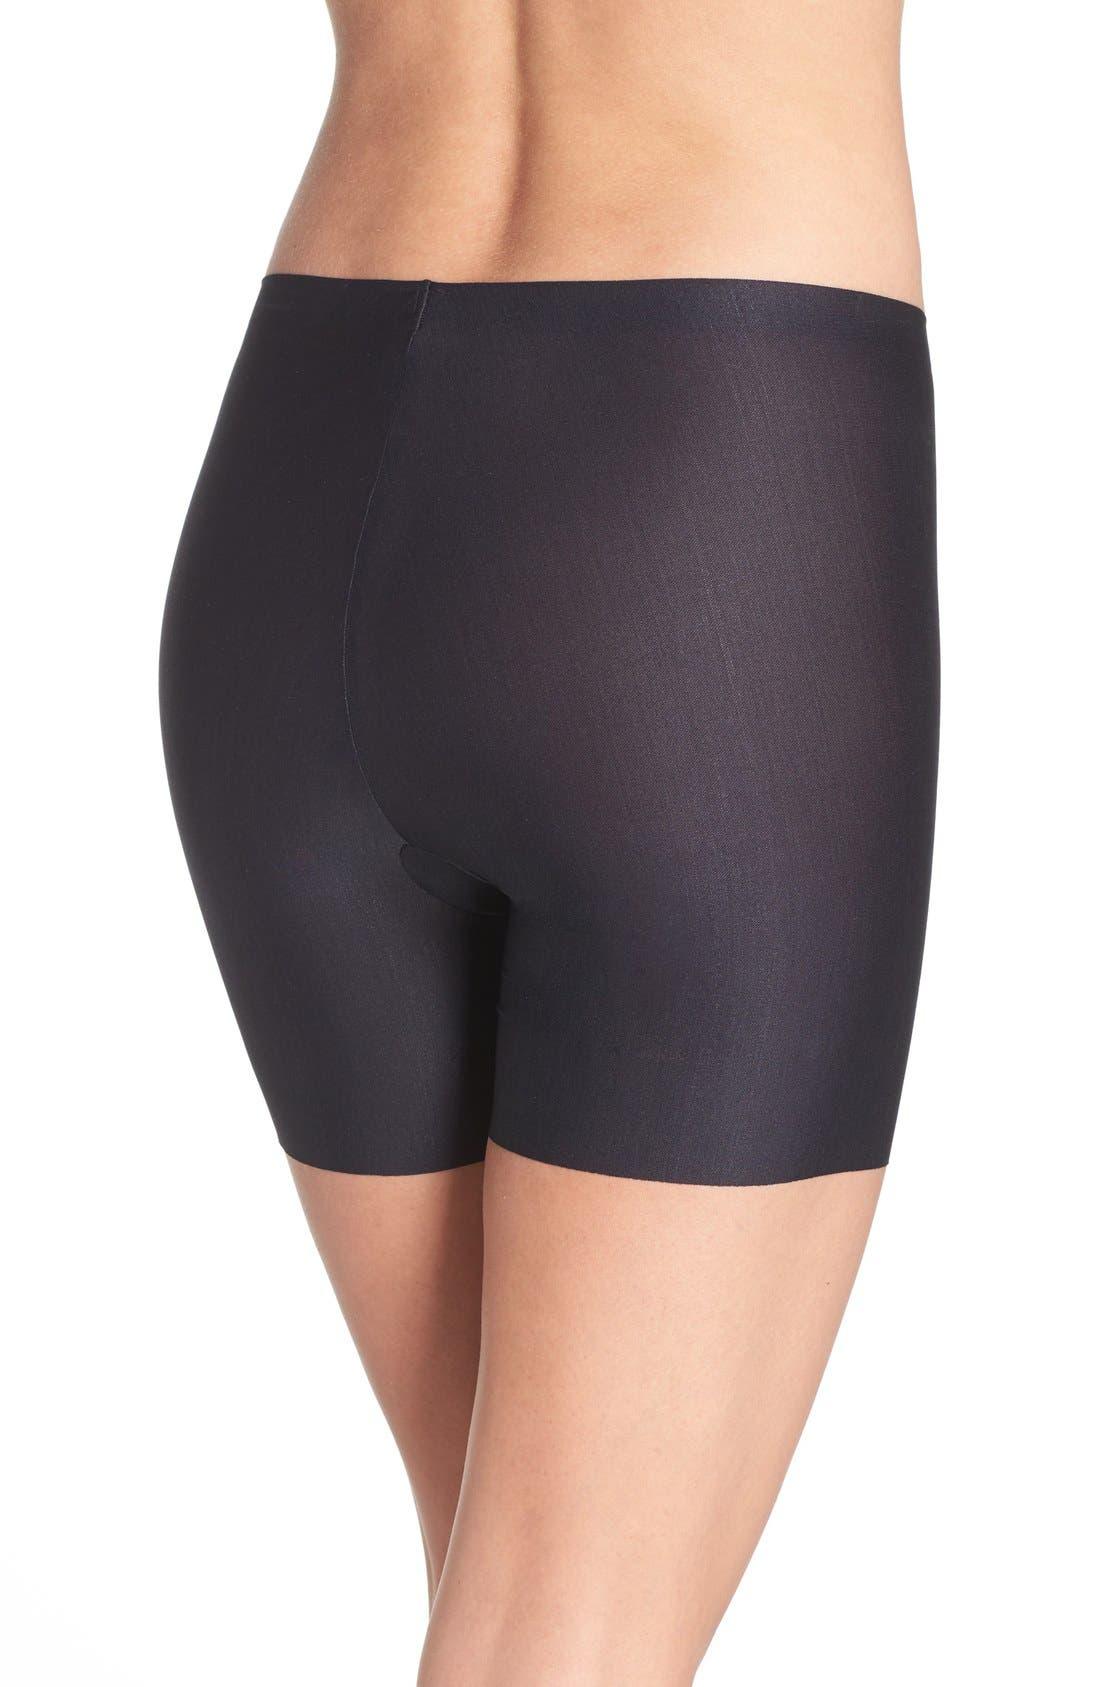 Body Base Smoothing Shorts,                             Alternate thumbnail 2, color,                             Black